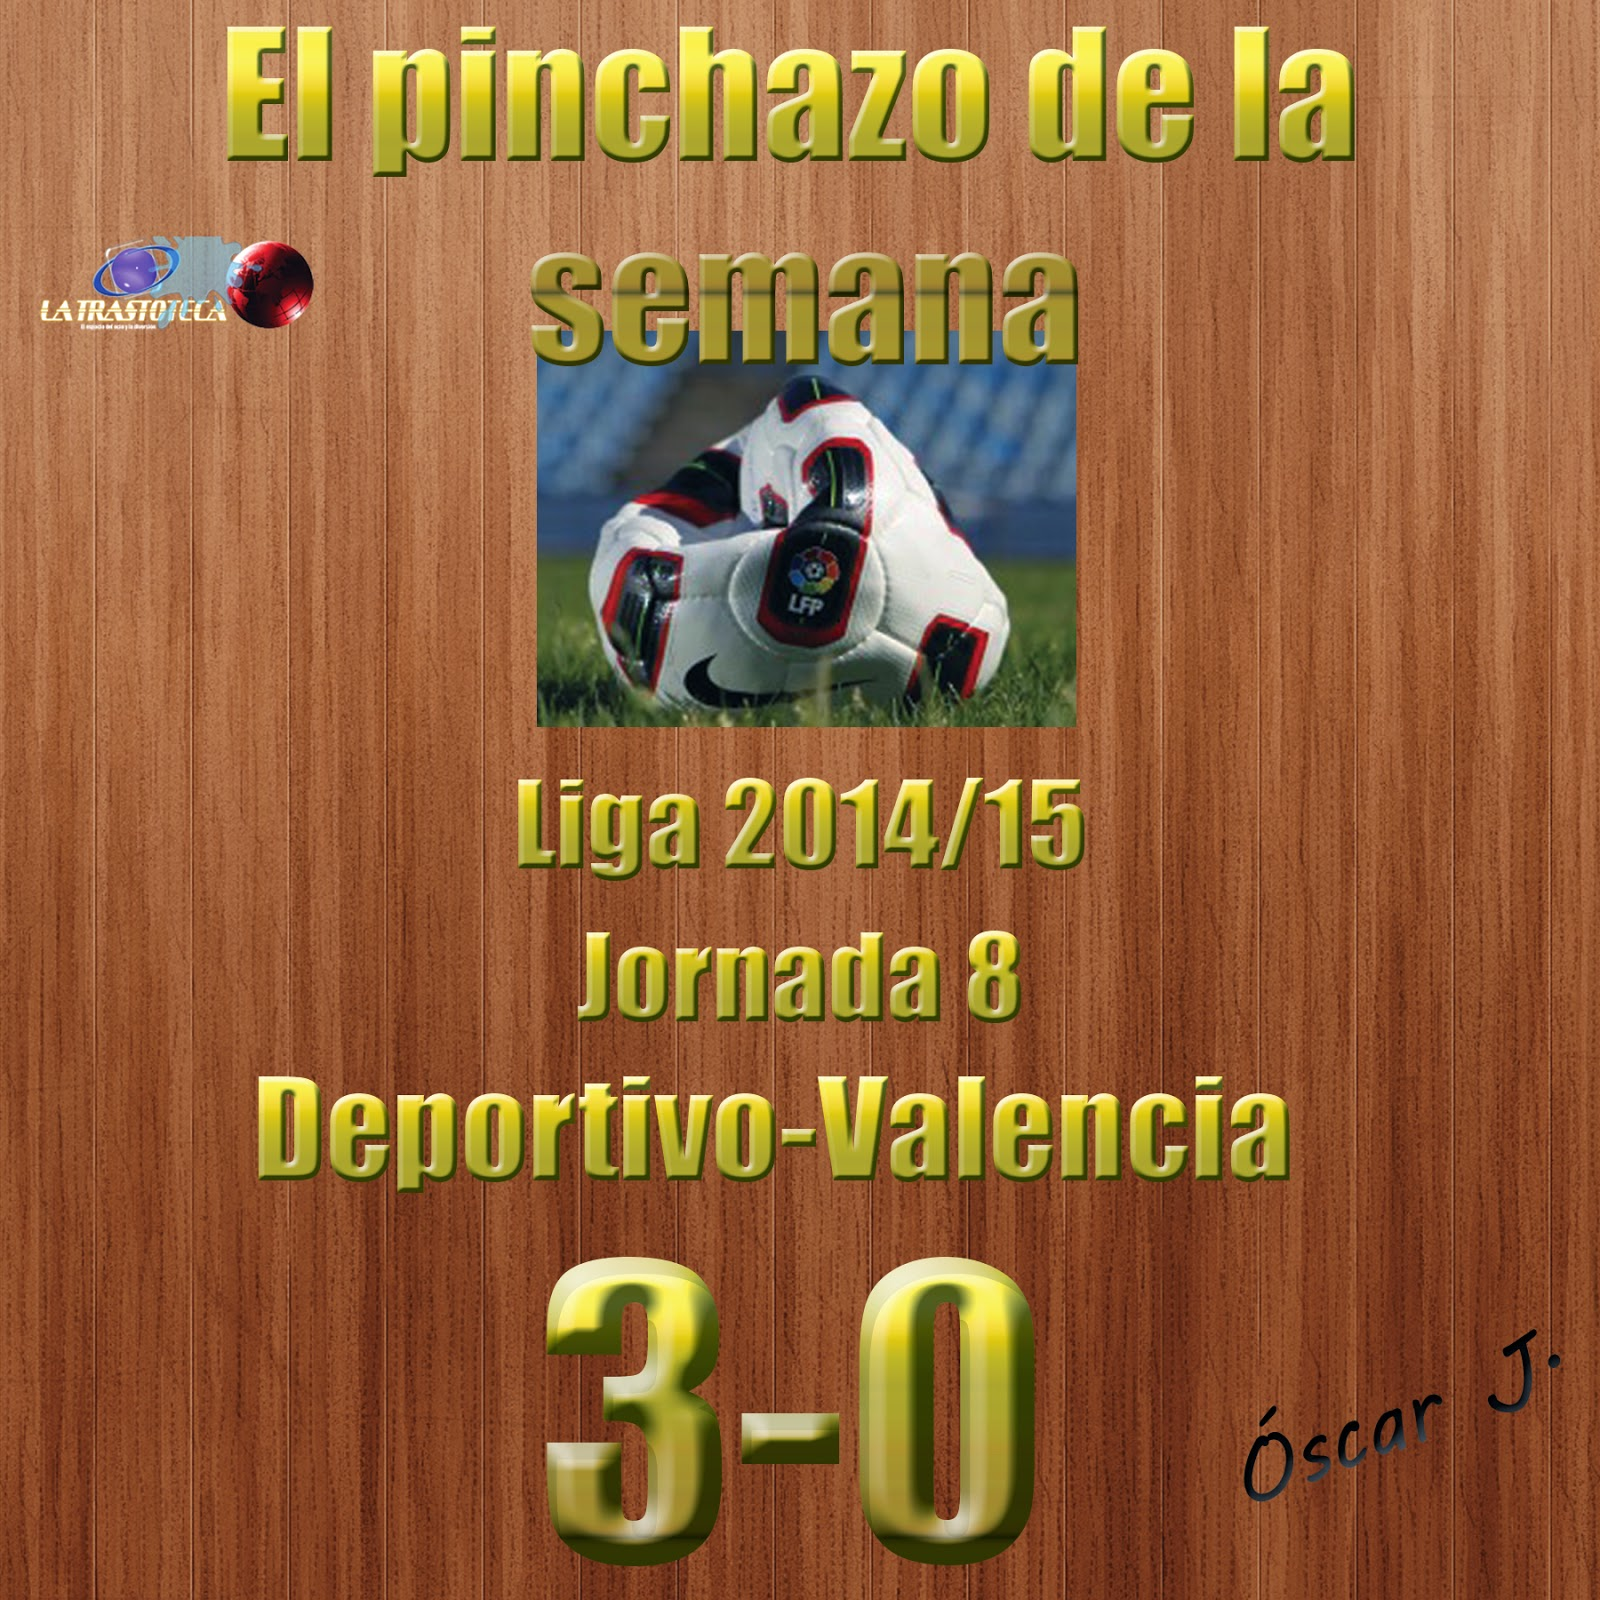 Deportivo 3-0 Valencia. Liga 2014/15 - Jornada 8. El pinchazo de la semana.